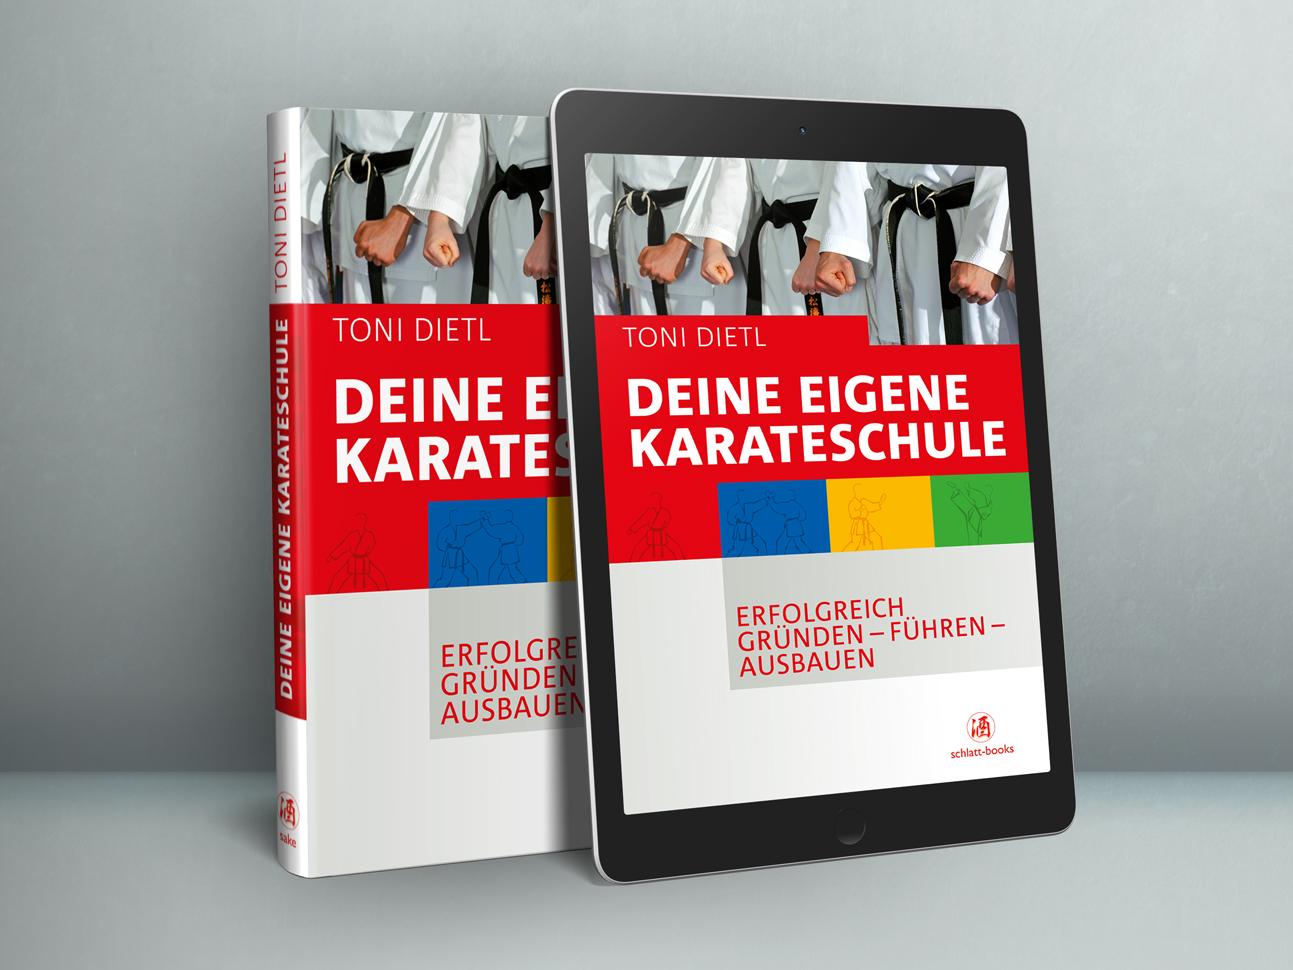 martin_zech_design_buchcover_design_buchcovergestaltung_self_publishing_self_publisher_selbstverlag